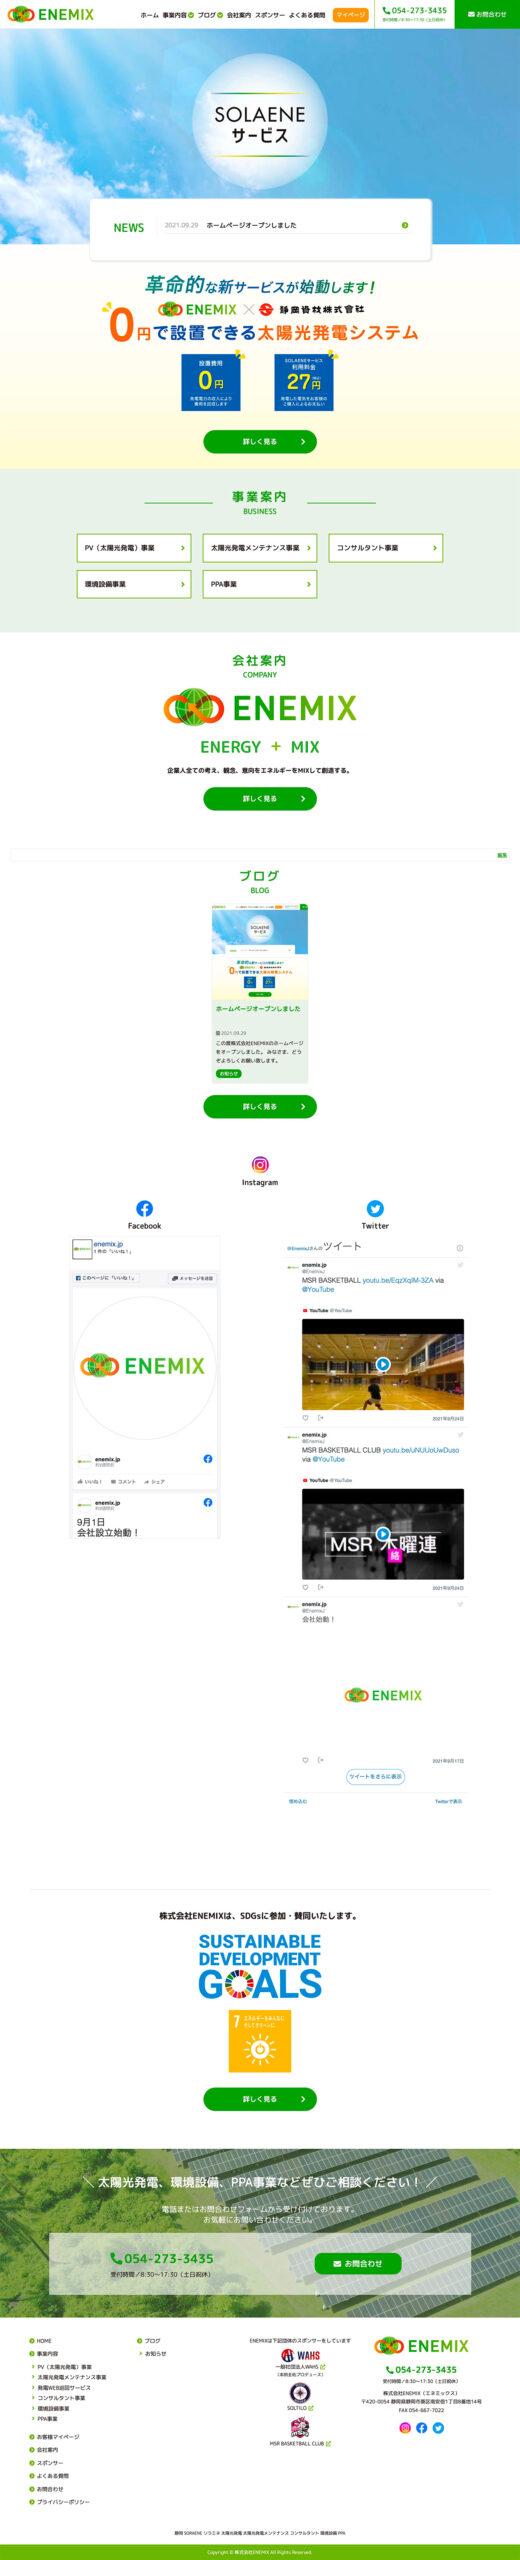 株式会社ENEMIX